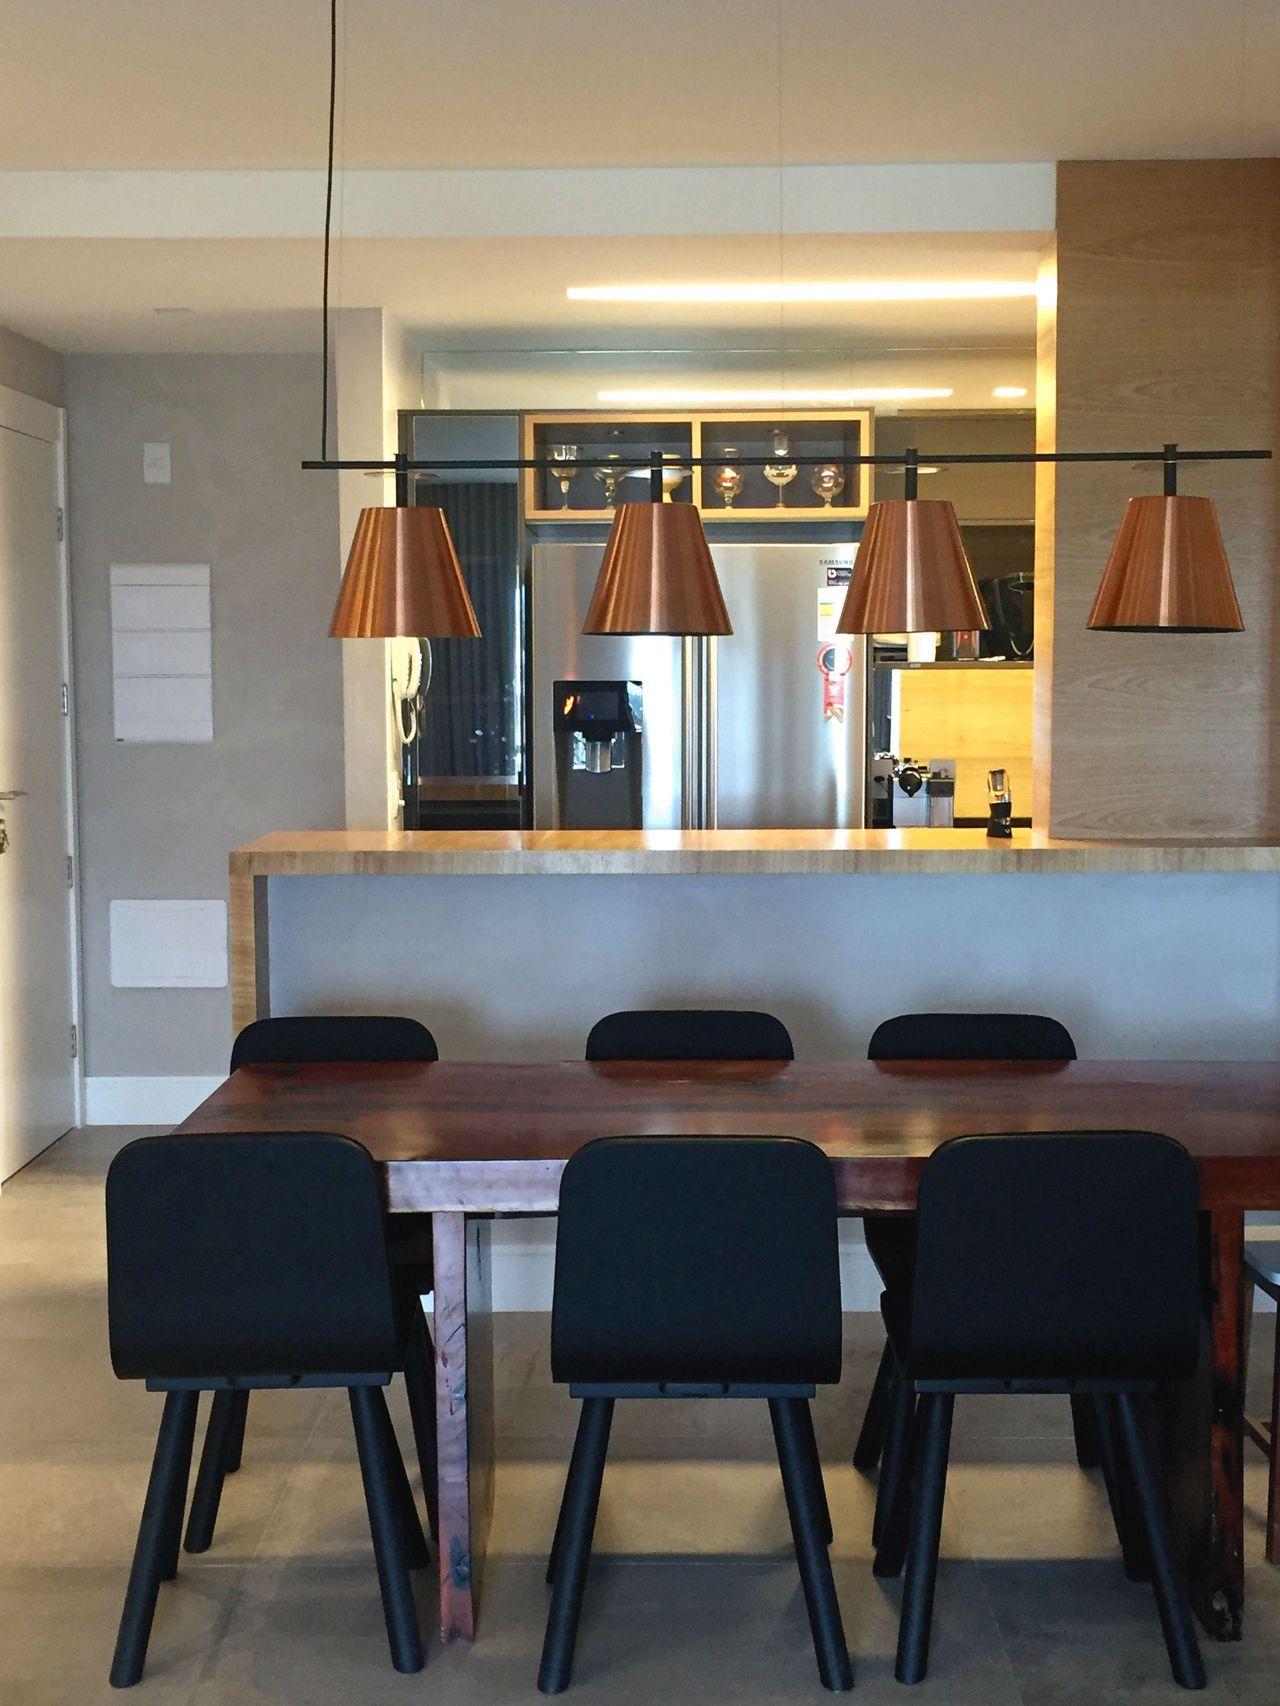 Cozinha Americana Com Sala Integrada Cozinha Integrada Sala Sala